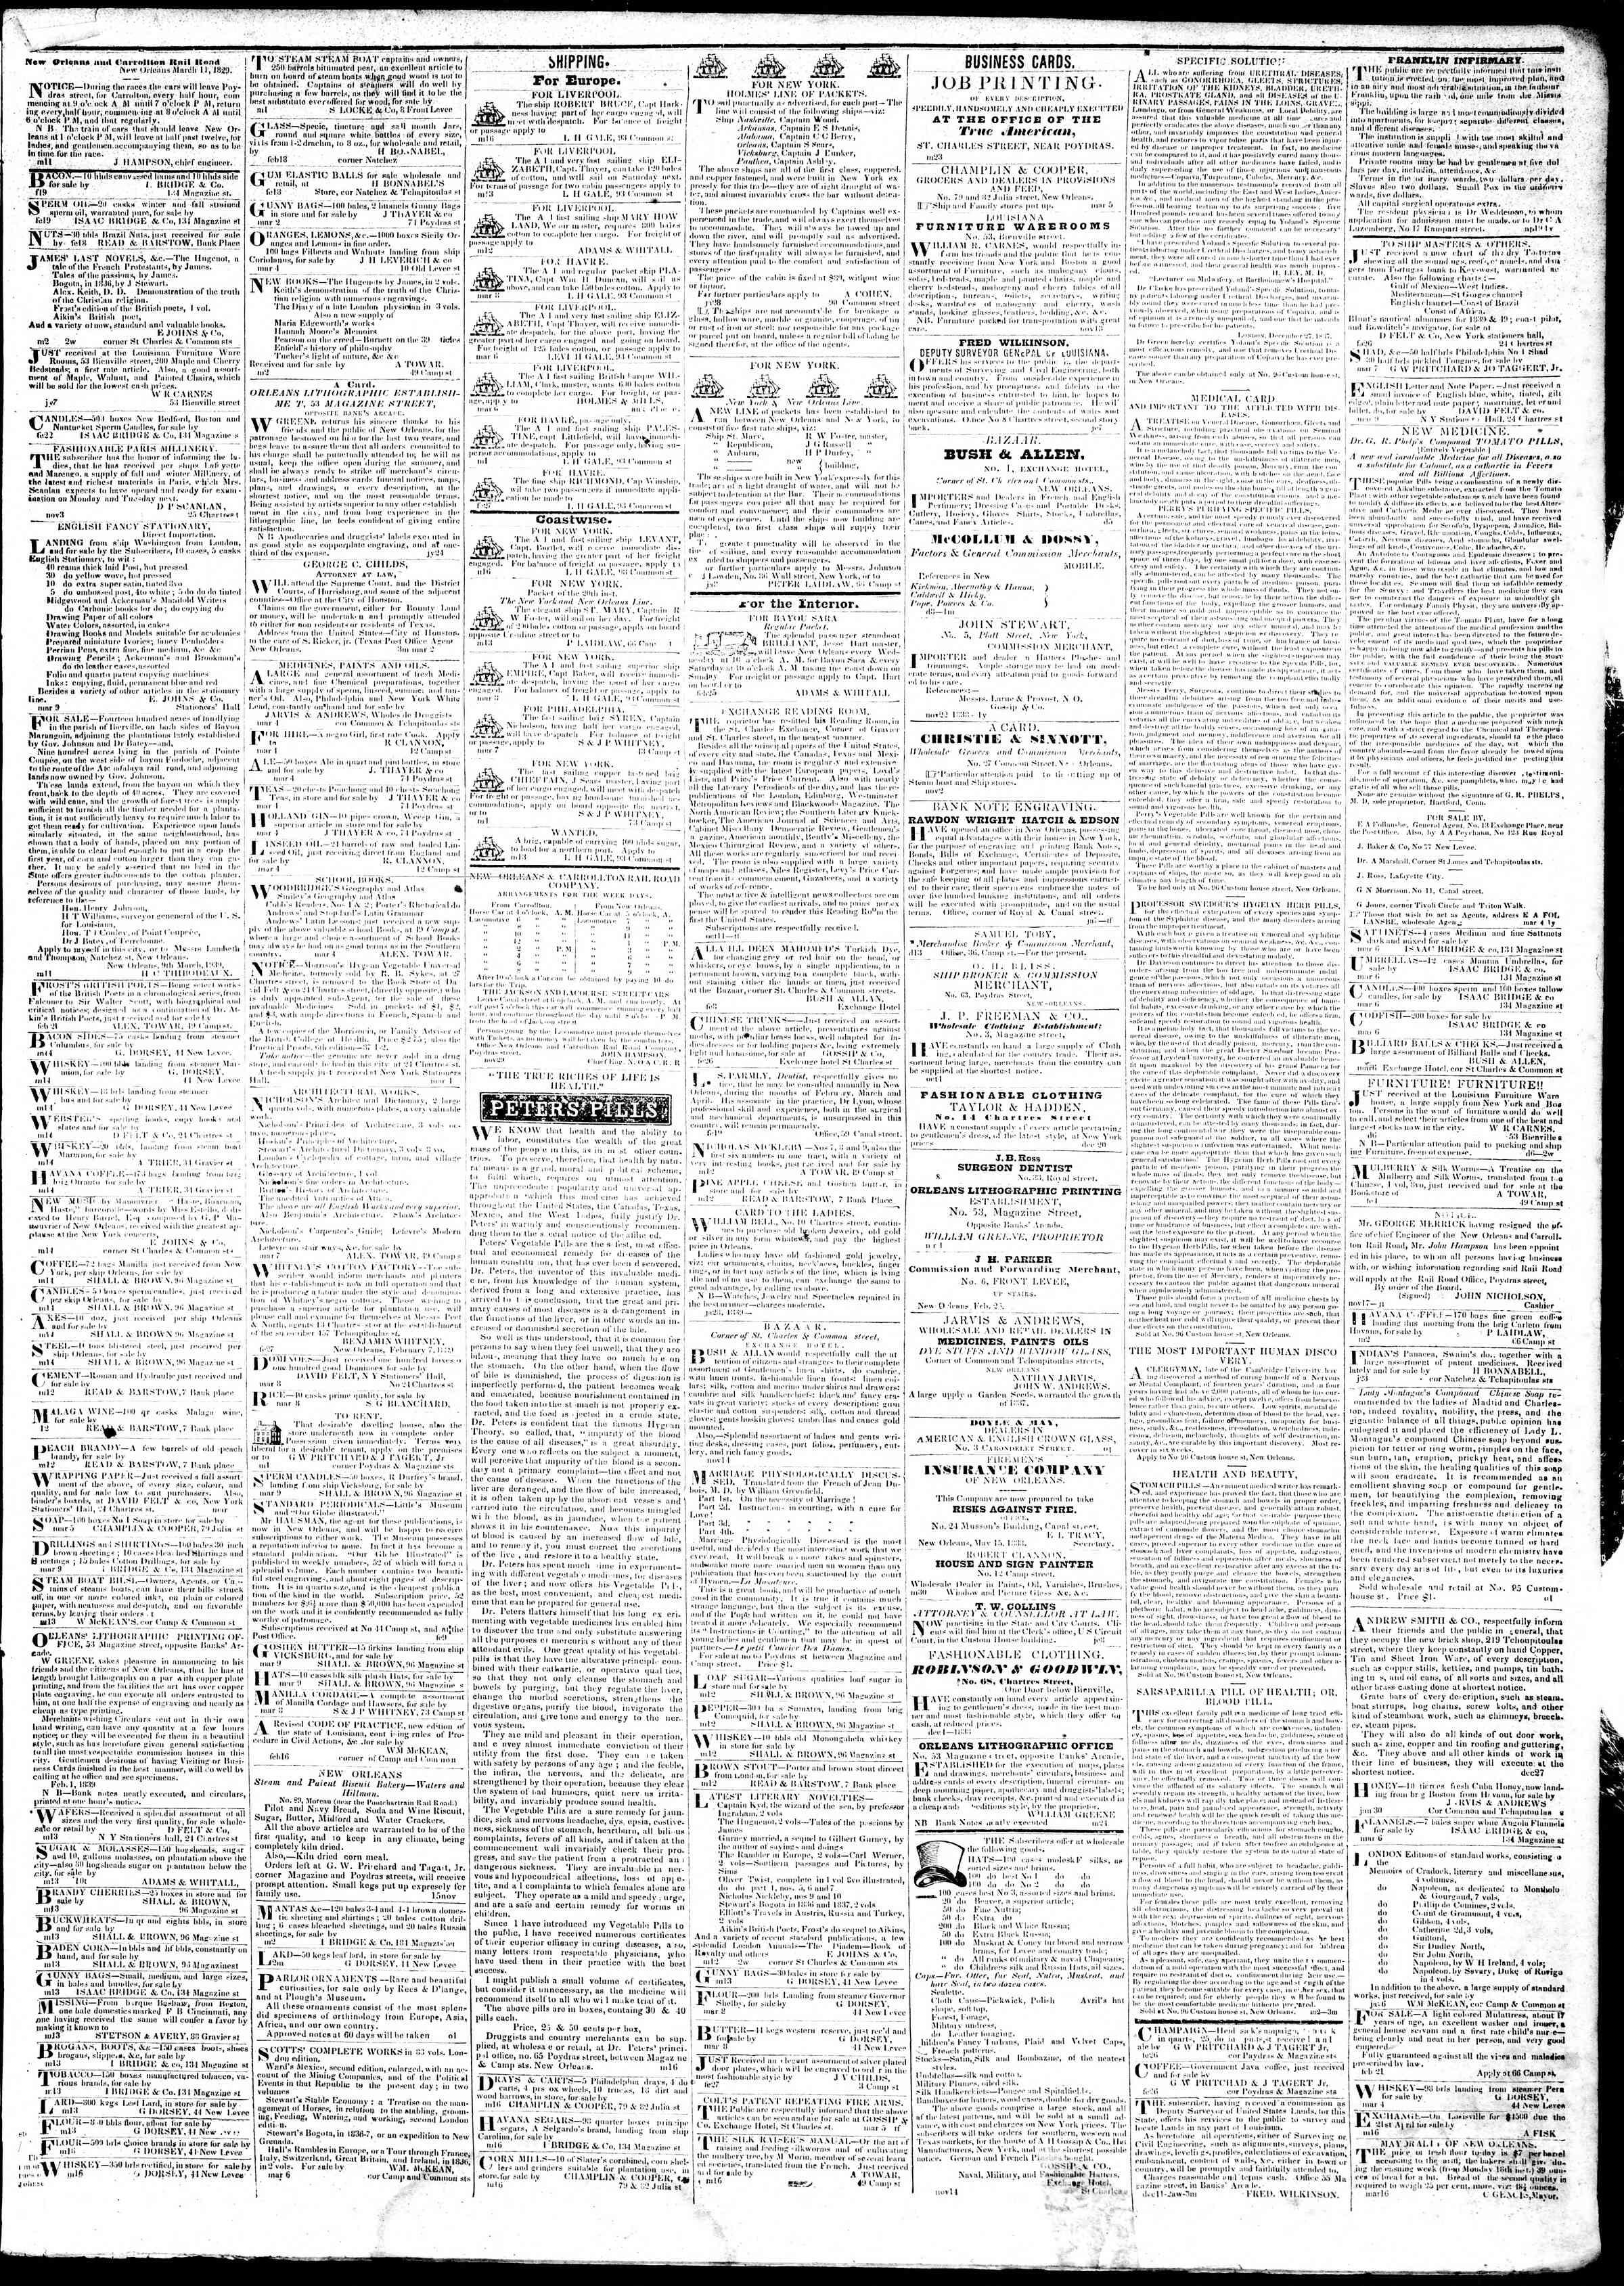 18 Mart 1839 Tarihli True American Gazetesi Sayfa 3